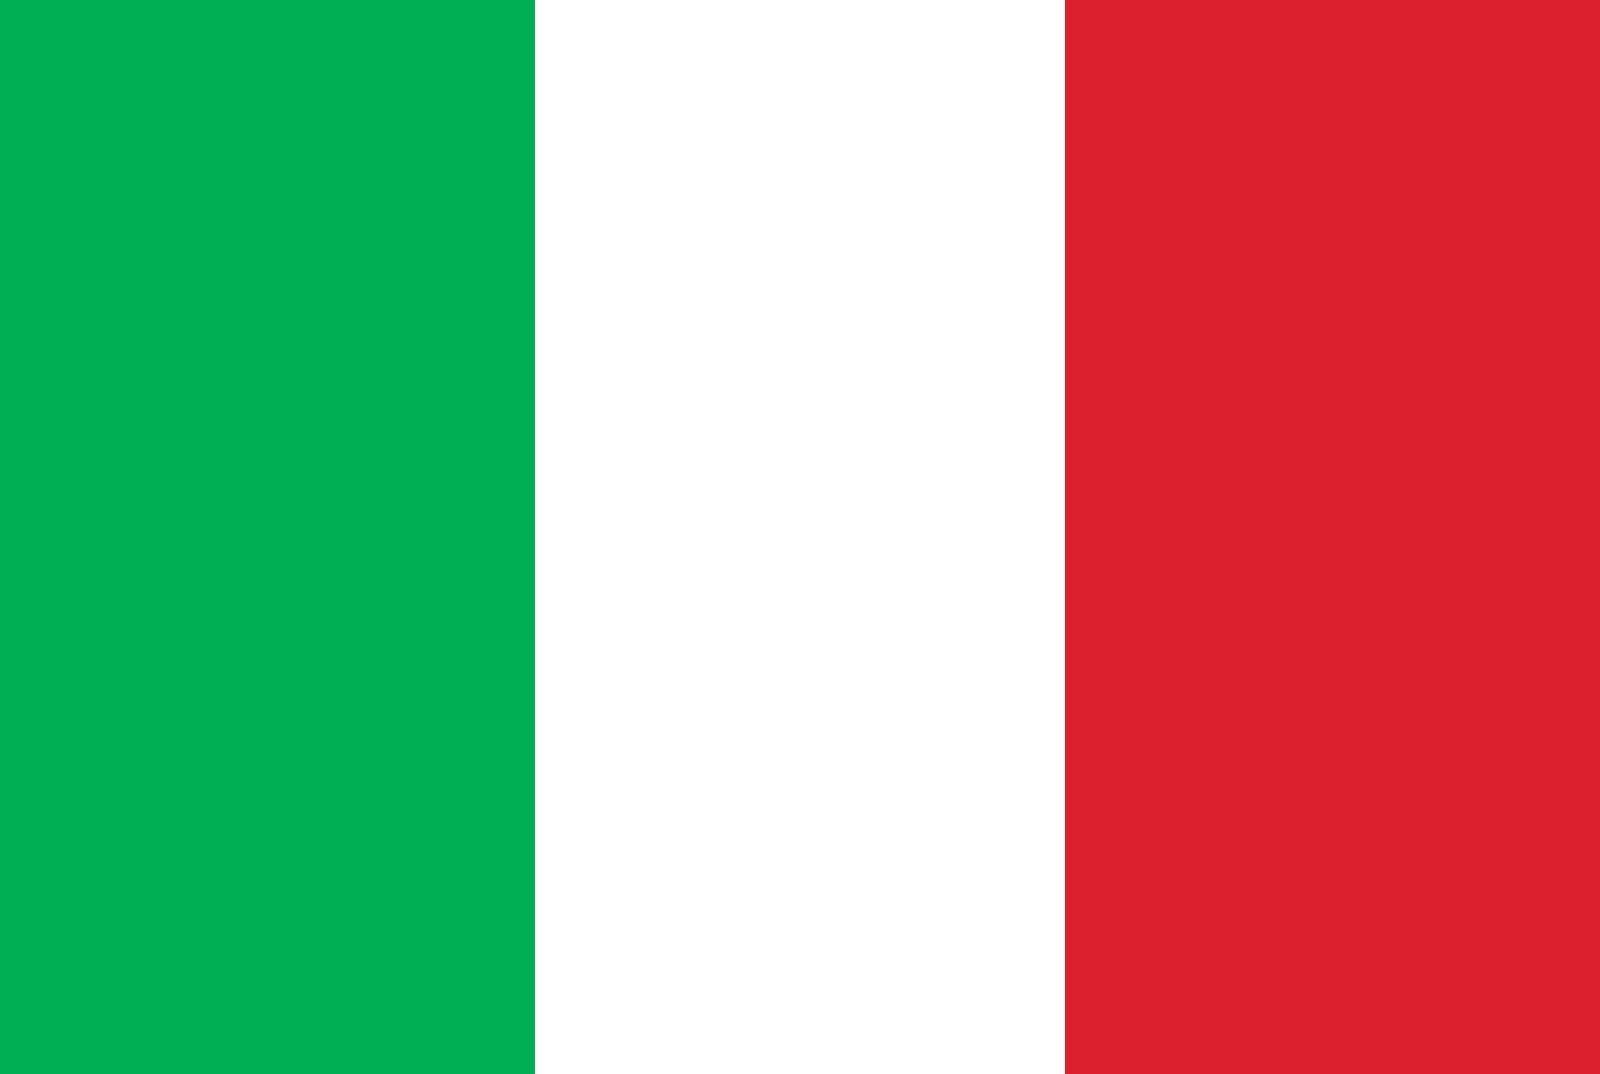 Vlag Italië Opsneeuwvakantie